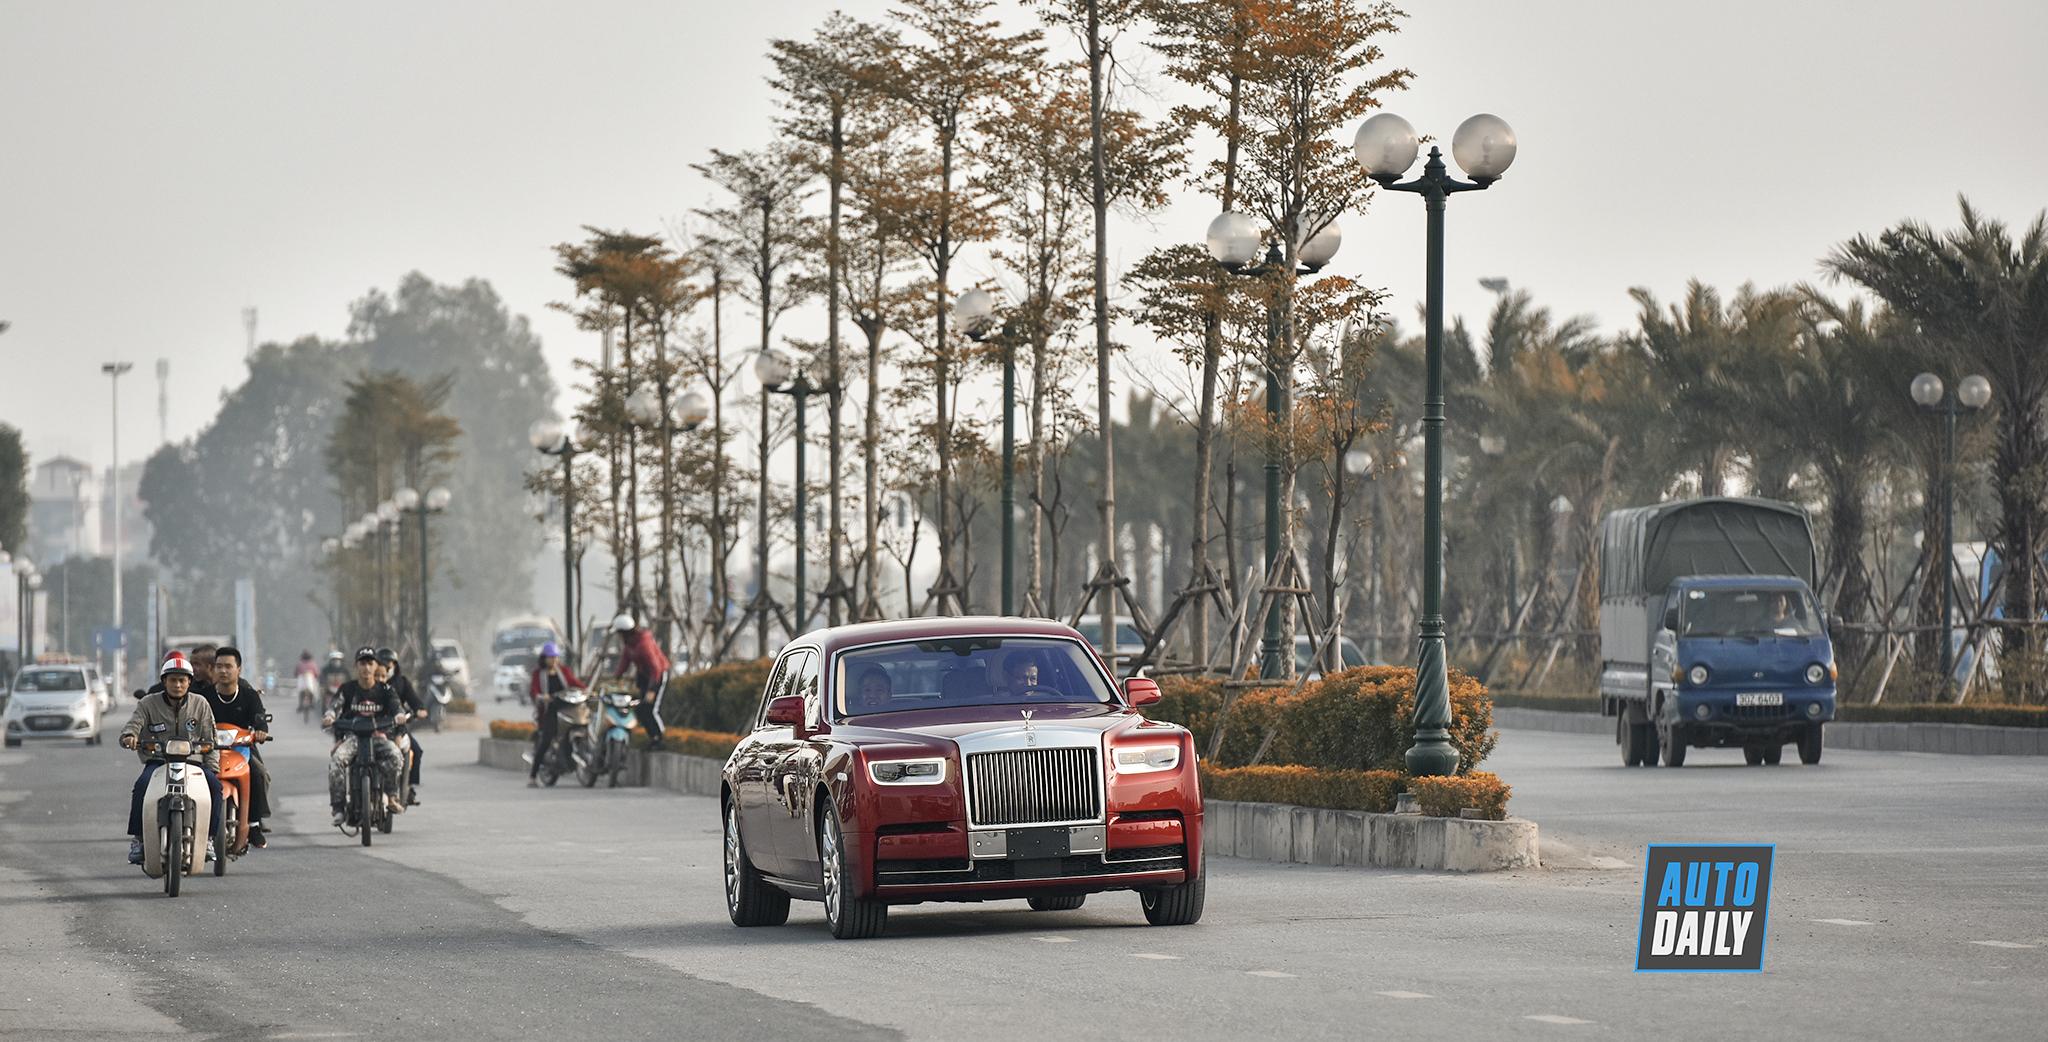 rolls-royce-phantom-2018-autodaily-2.jpg